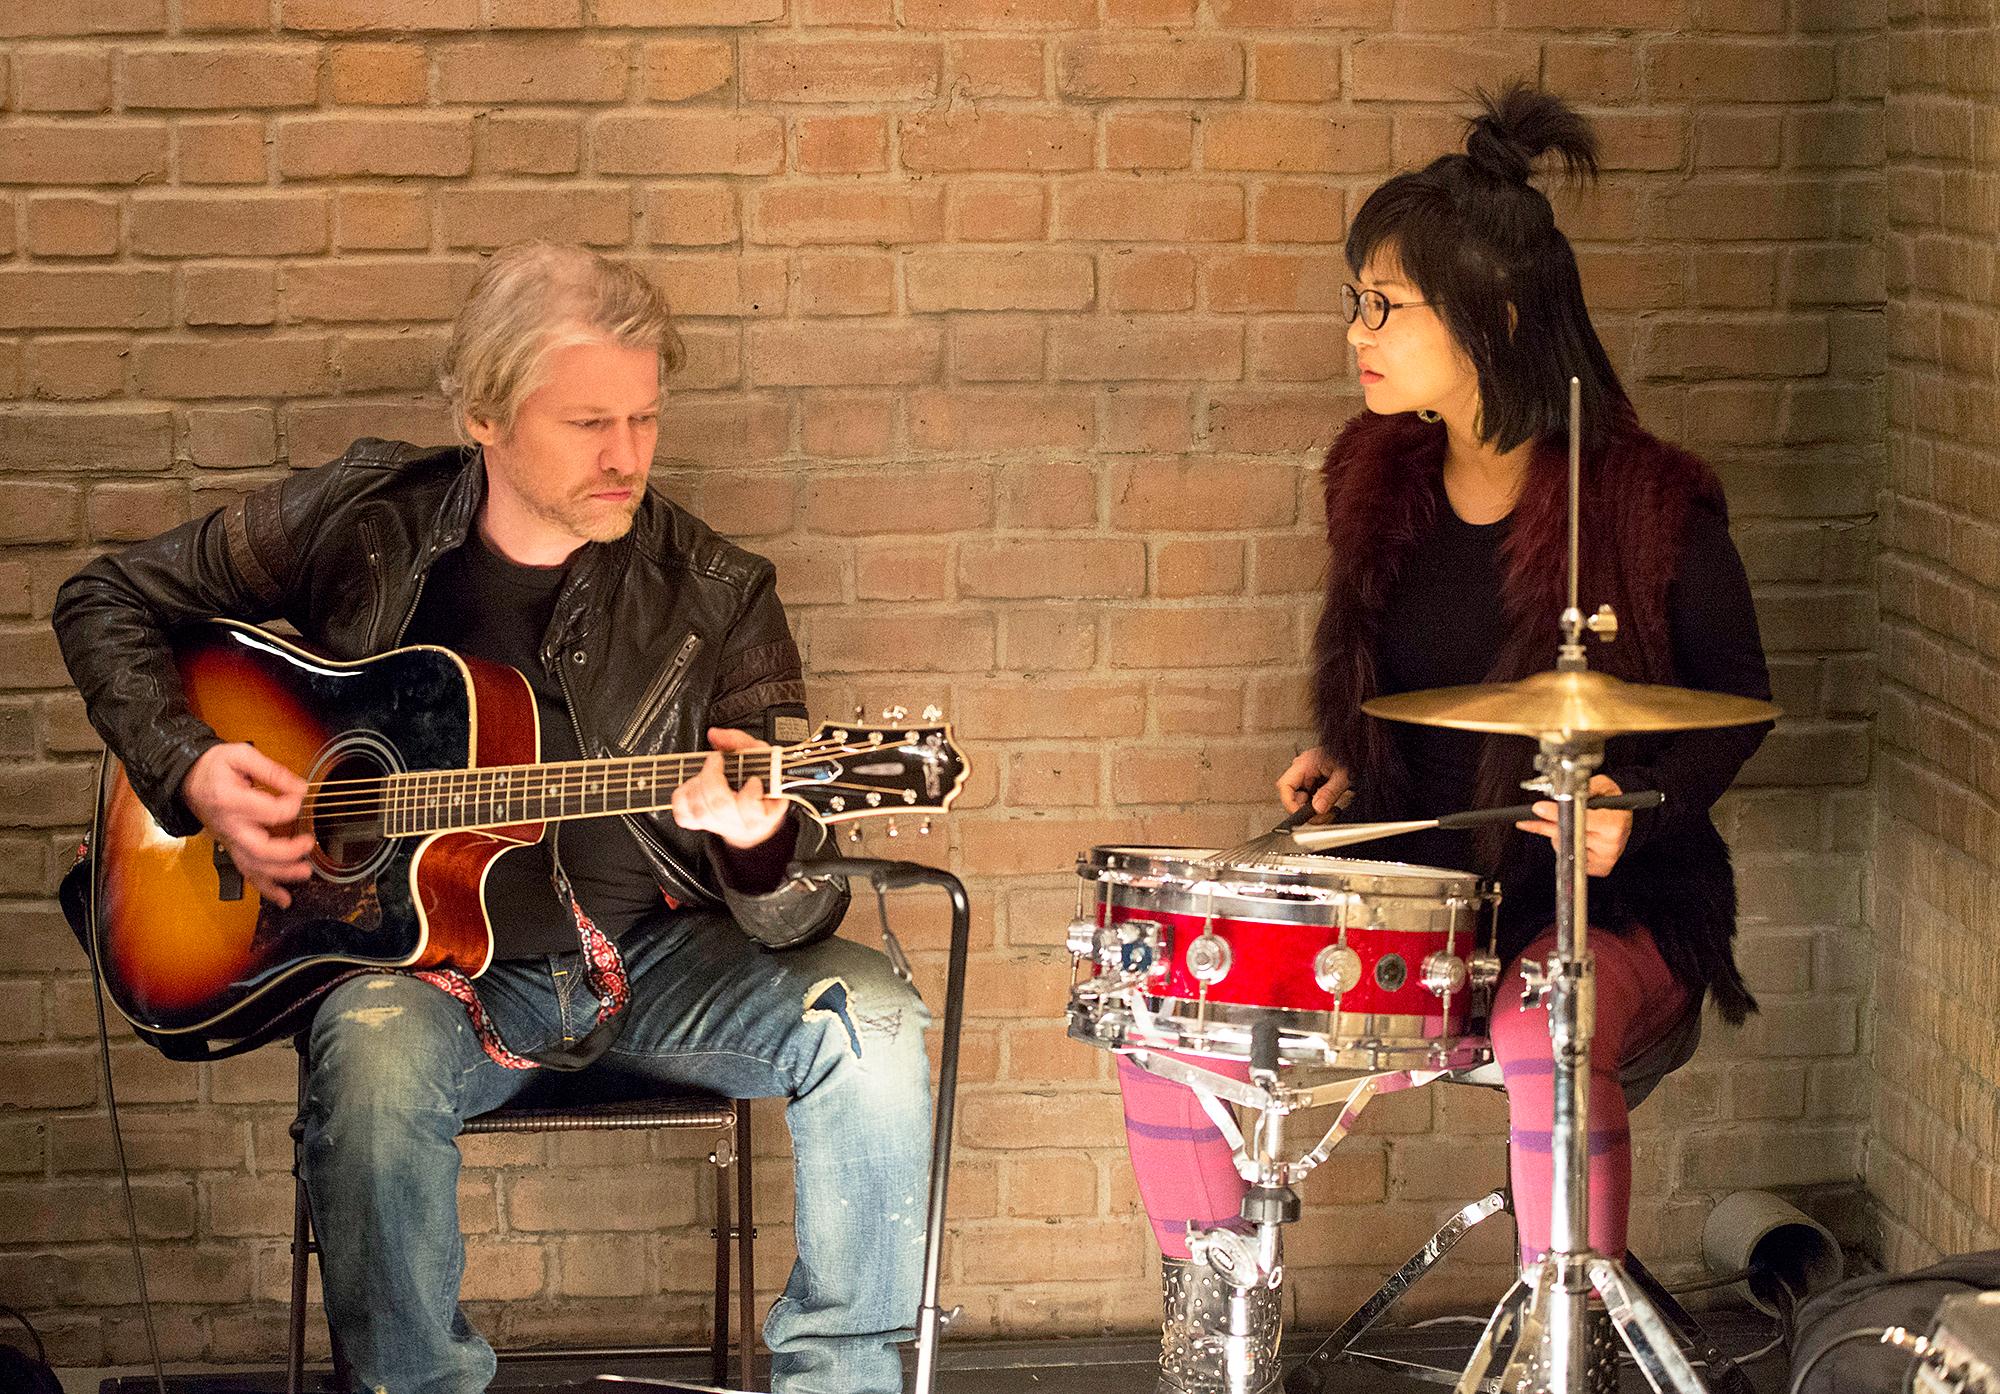 Todd Lowe and Keiko Agena